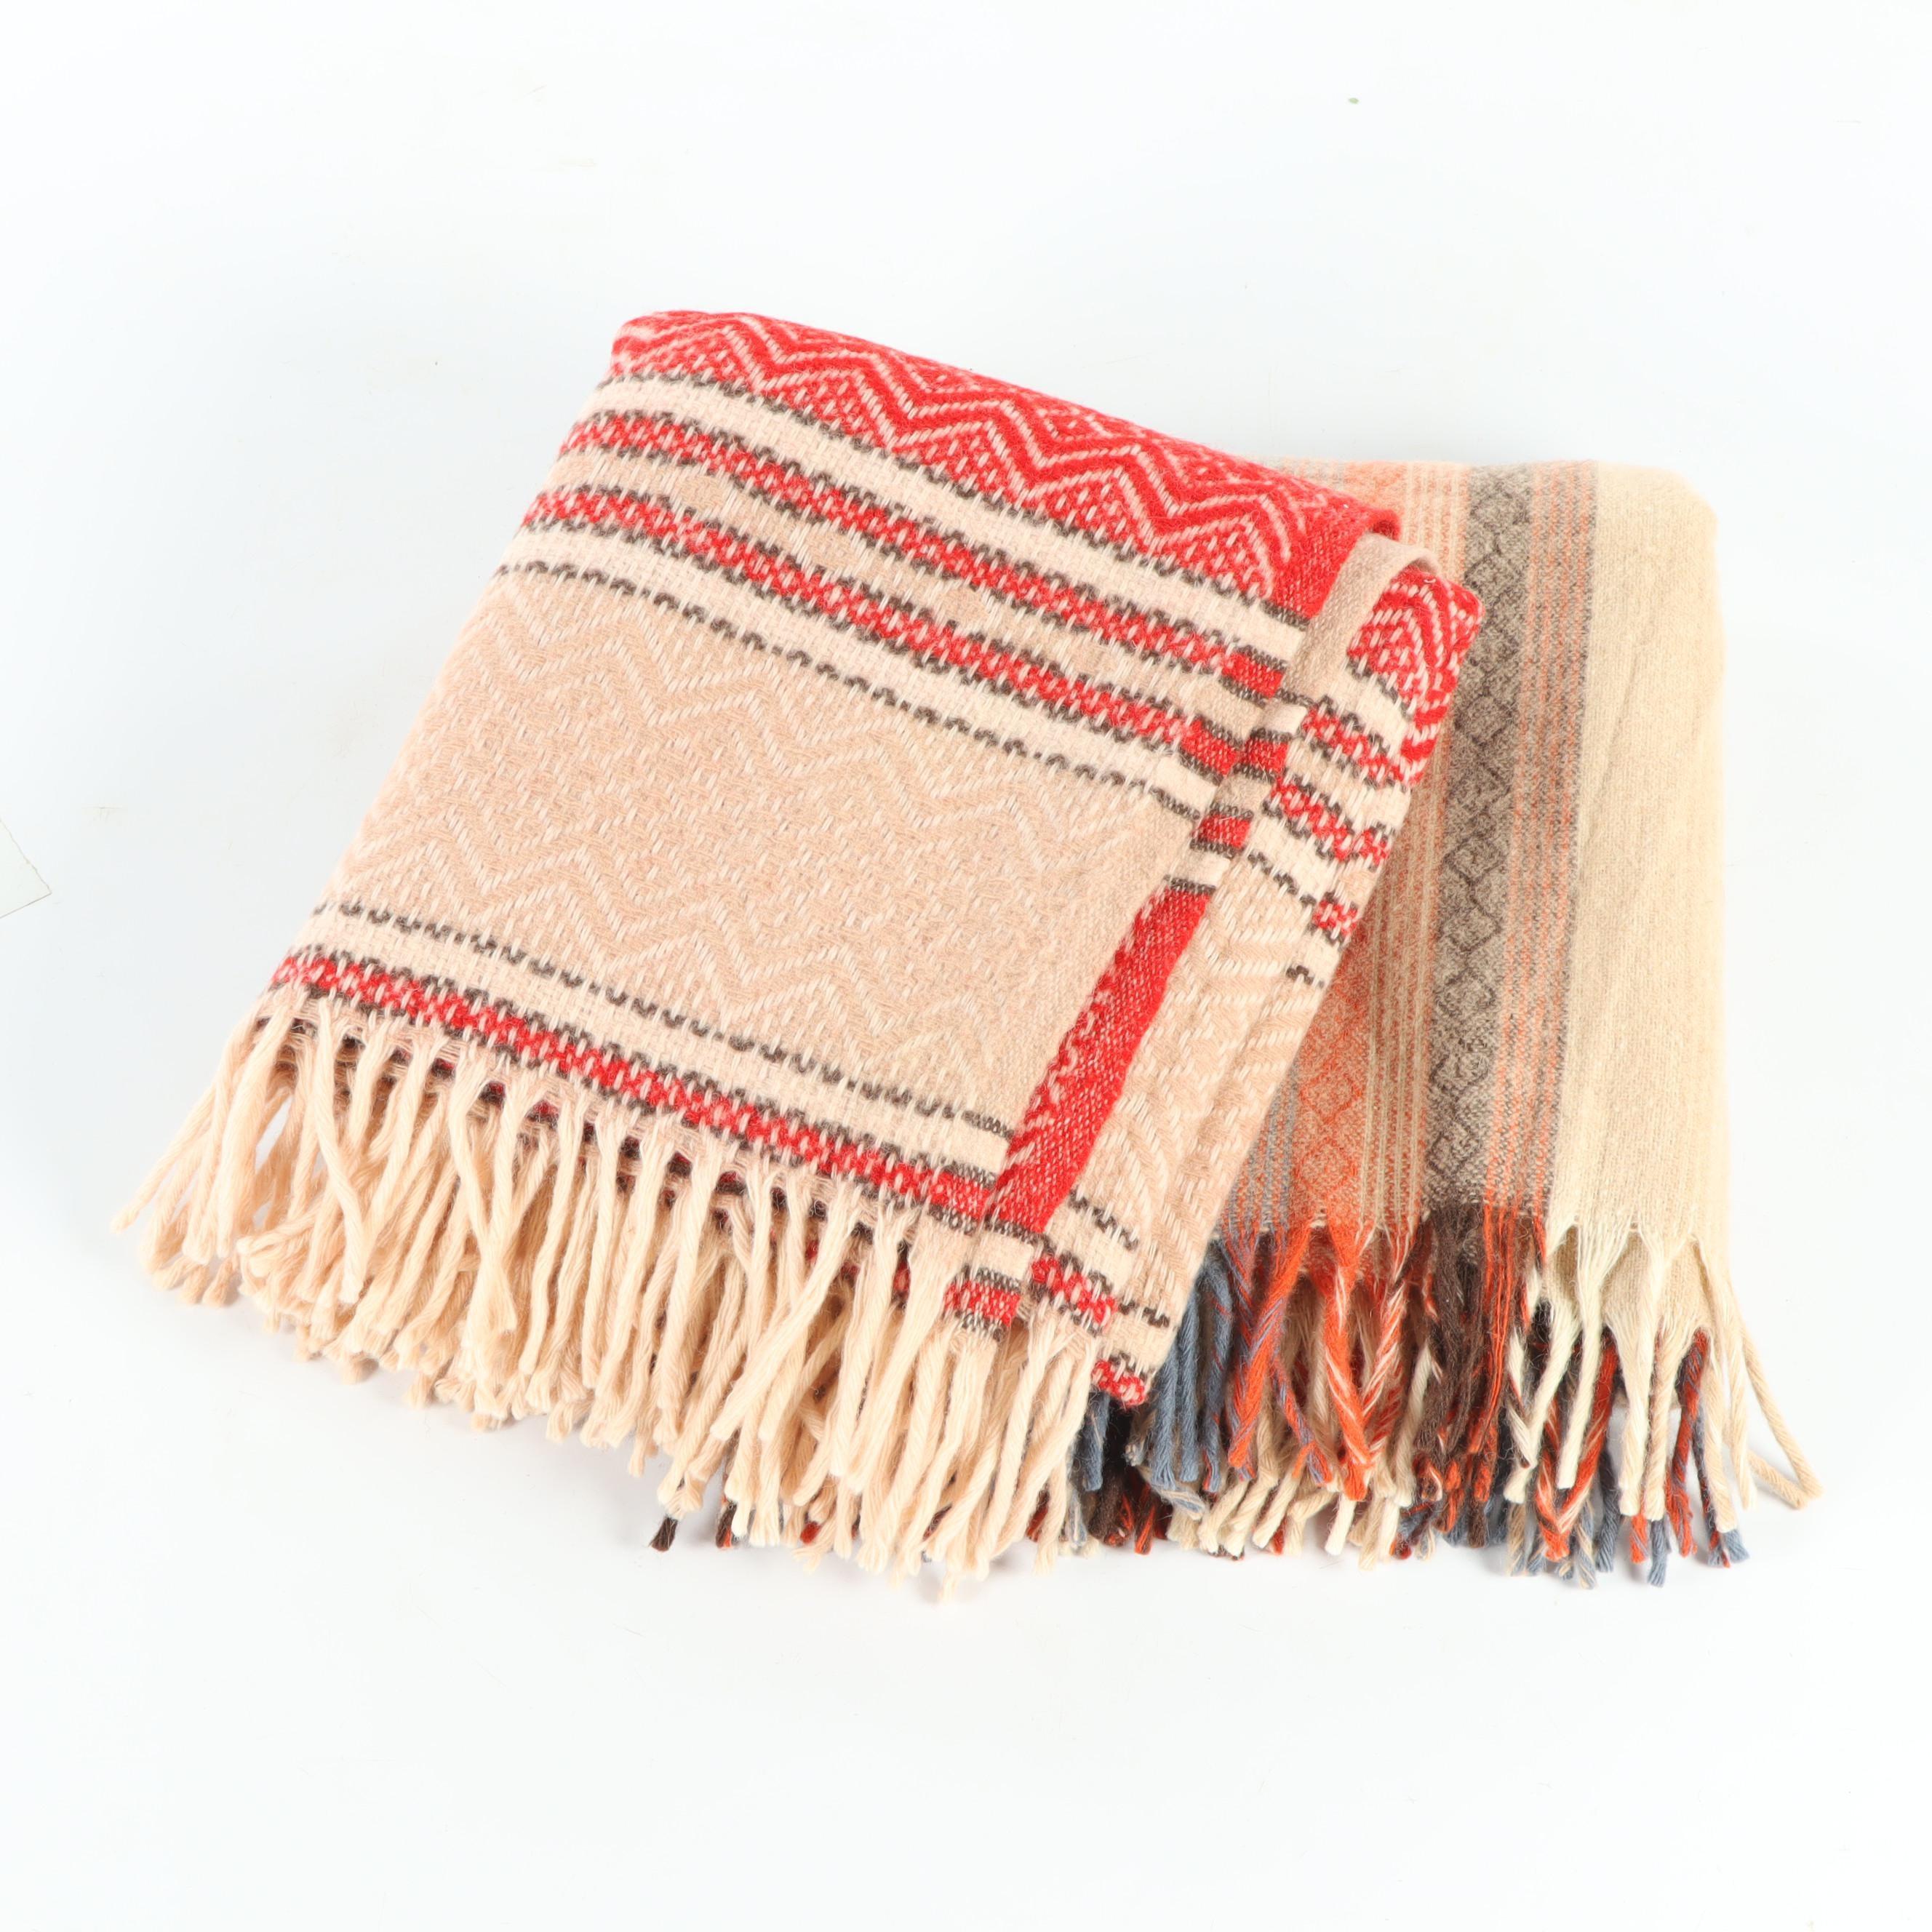 Faribo Plaid Wool Blankets, Vintage